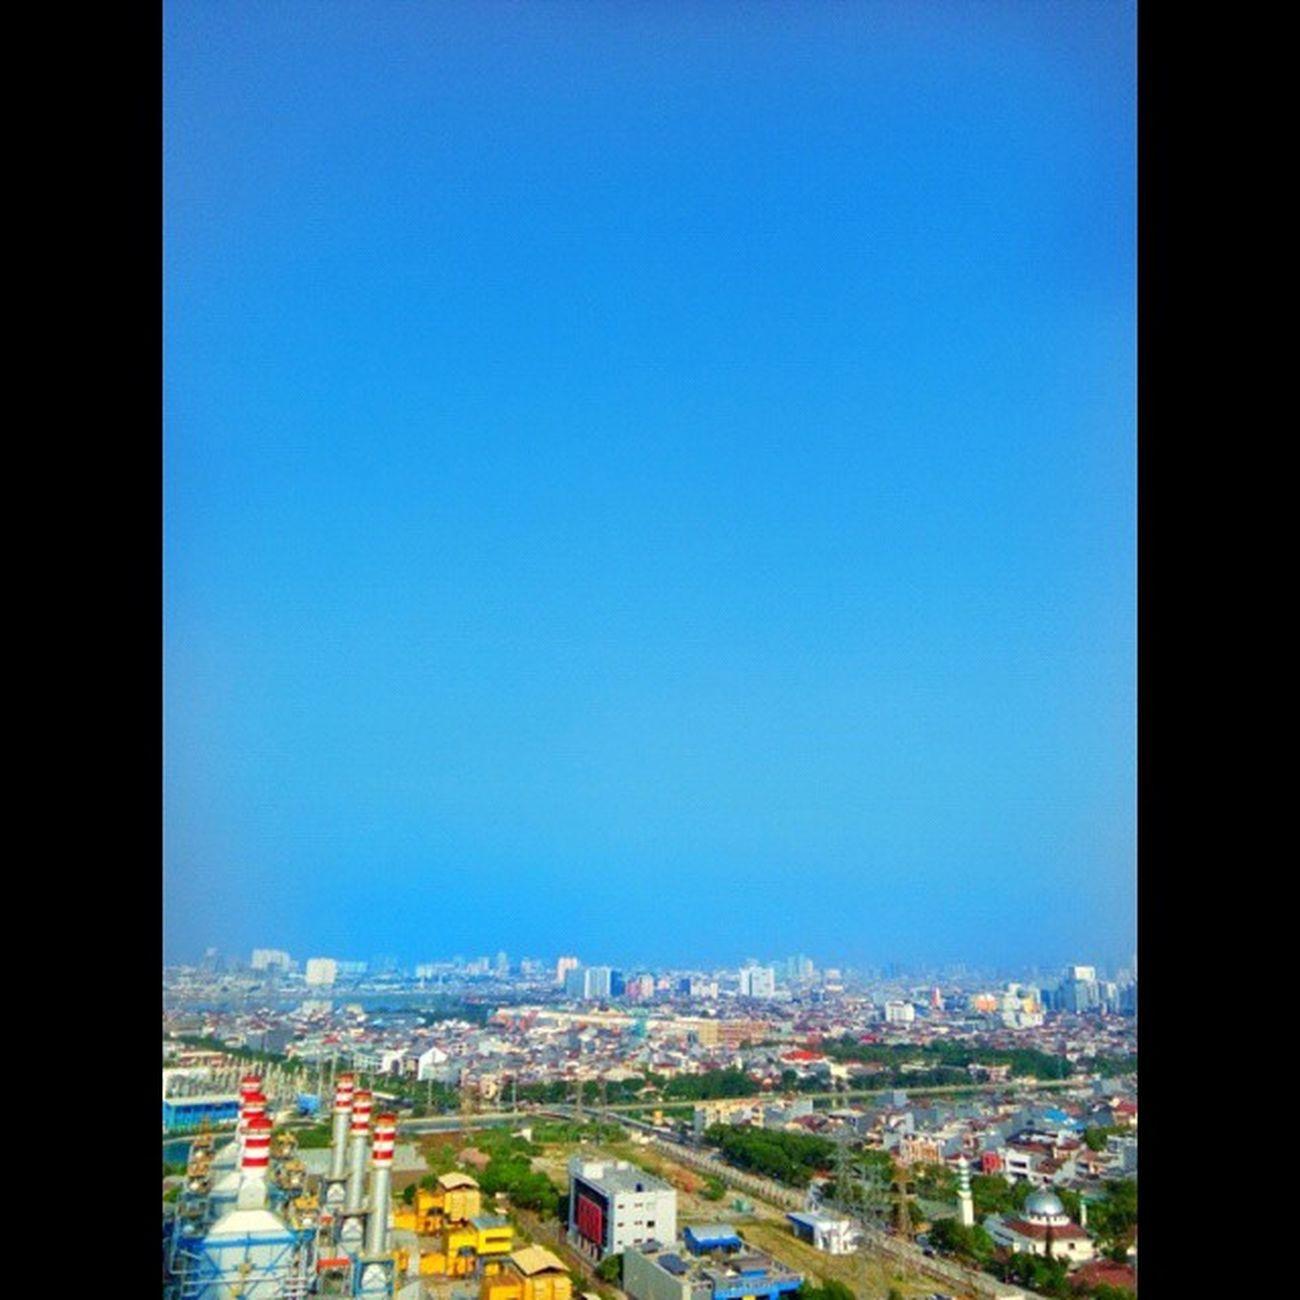 Instasize Architecture Instagood INDONESIA Citylife UrbanART Greenbay